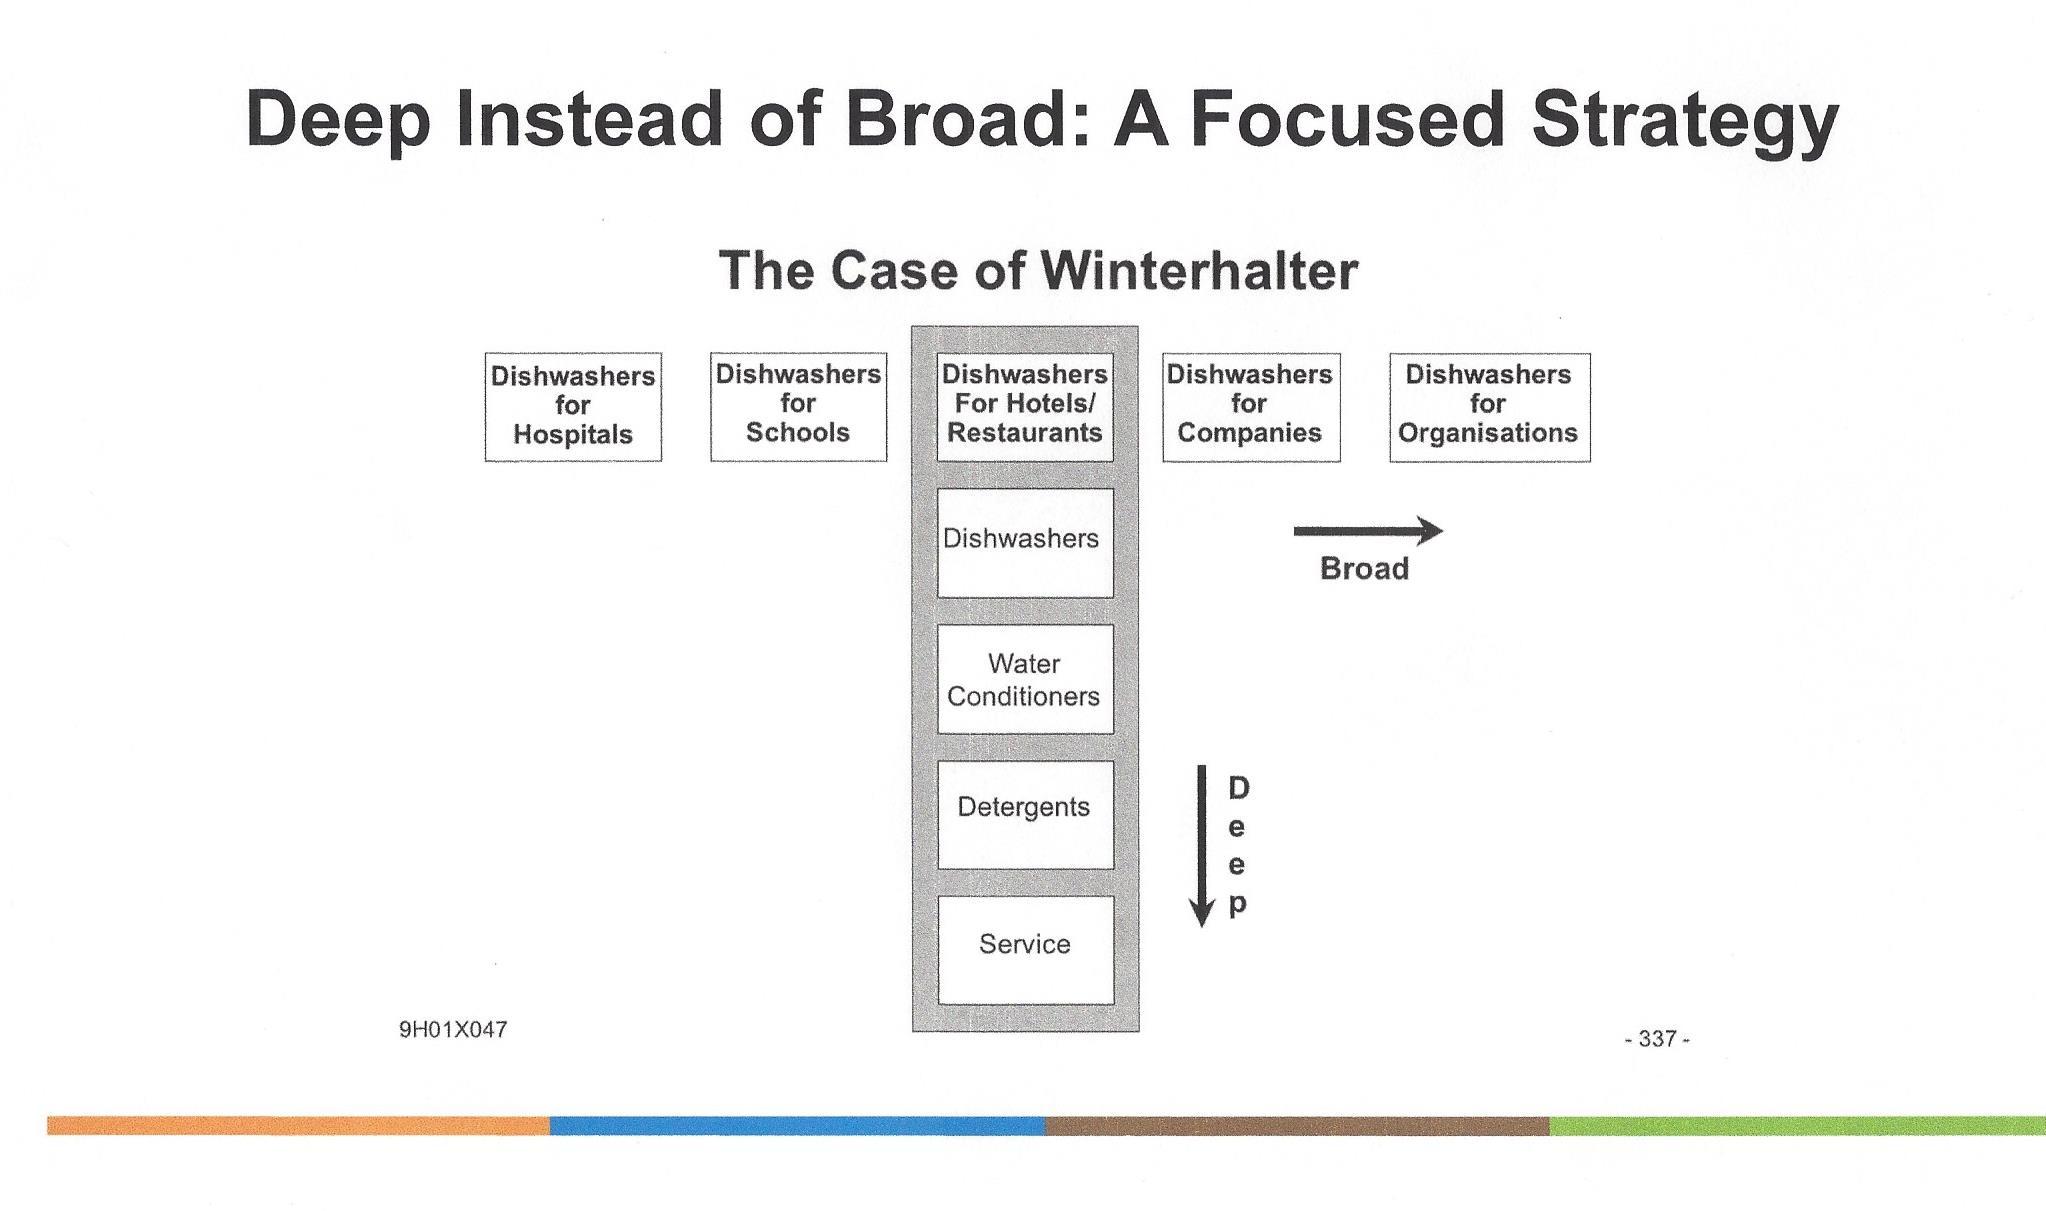 Focused Strategy - Deep Instead of Broad Winterhalter